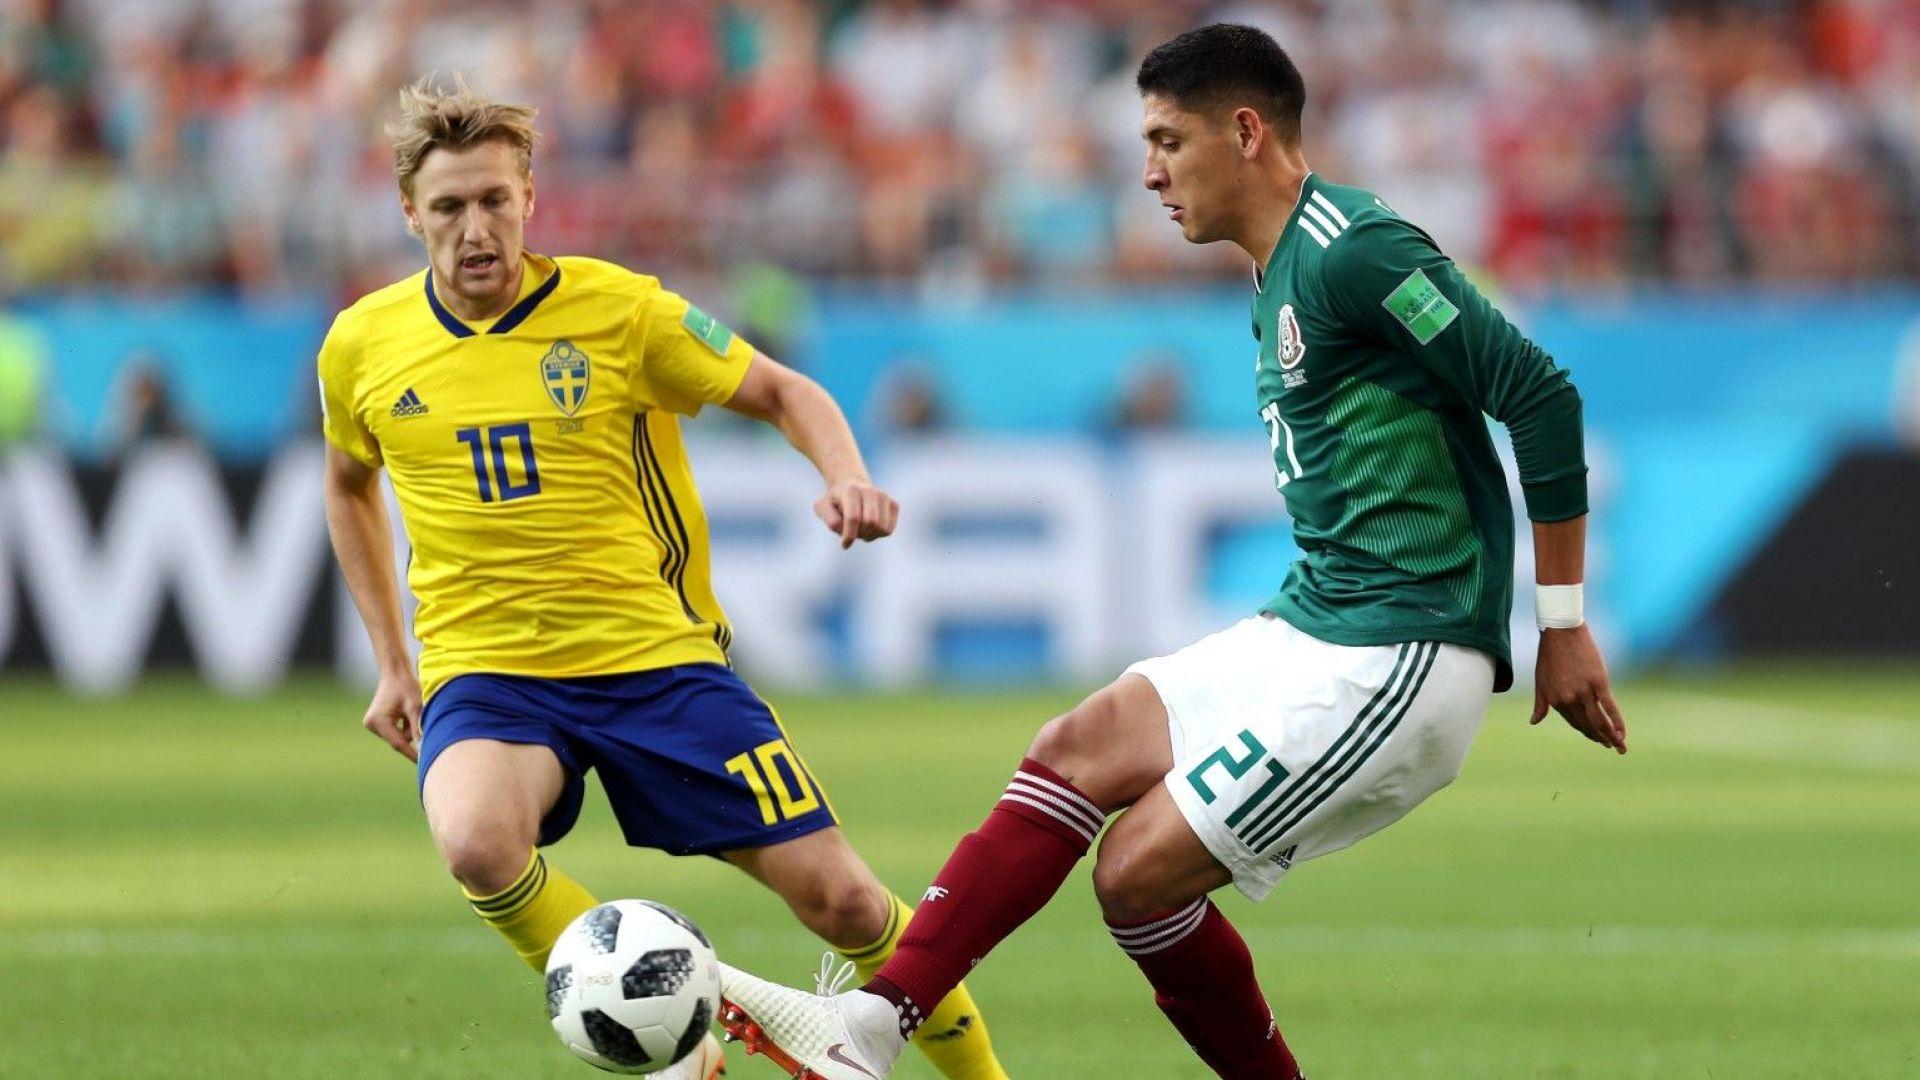 Мексико - Швеция 0:3 (статистика)